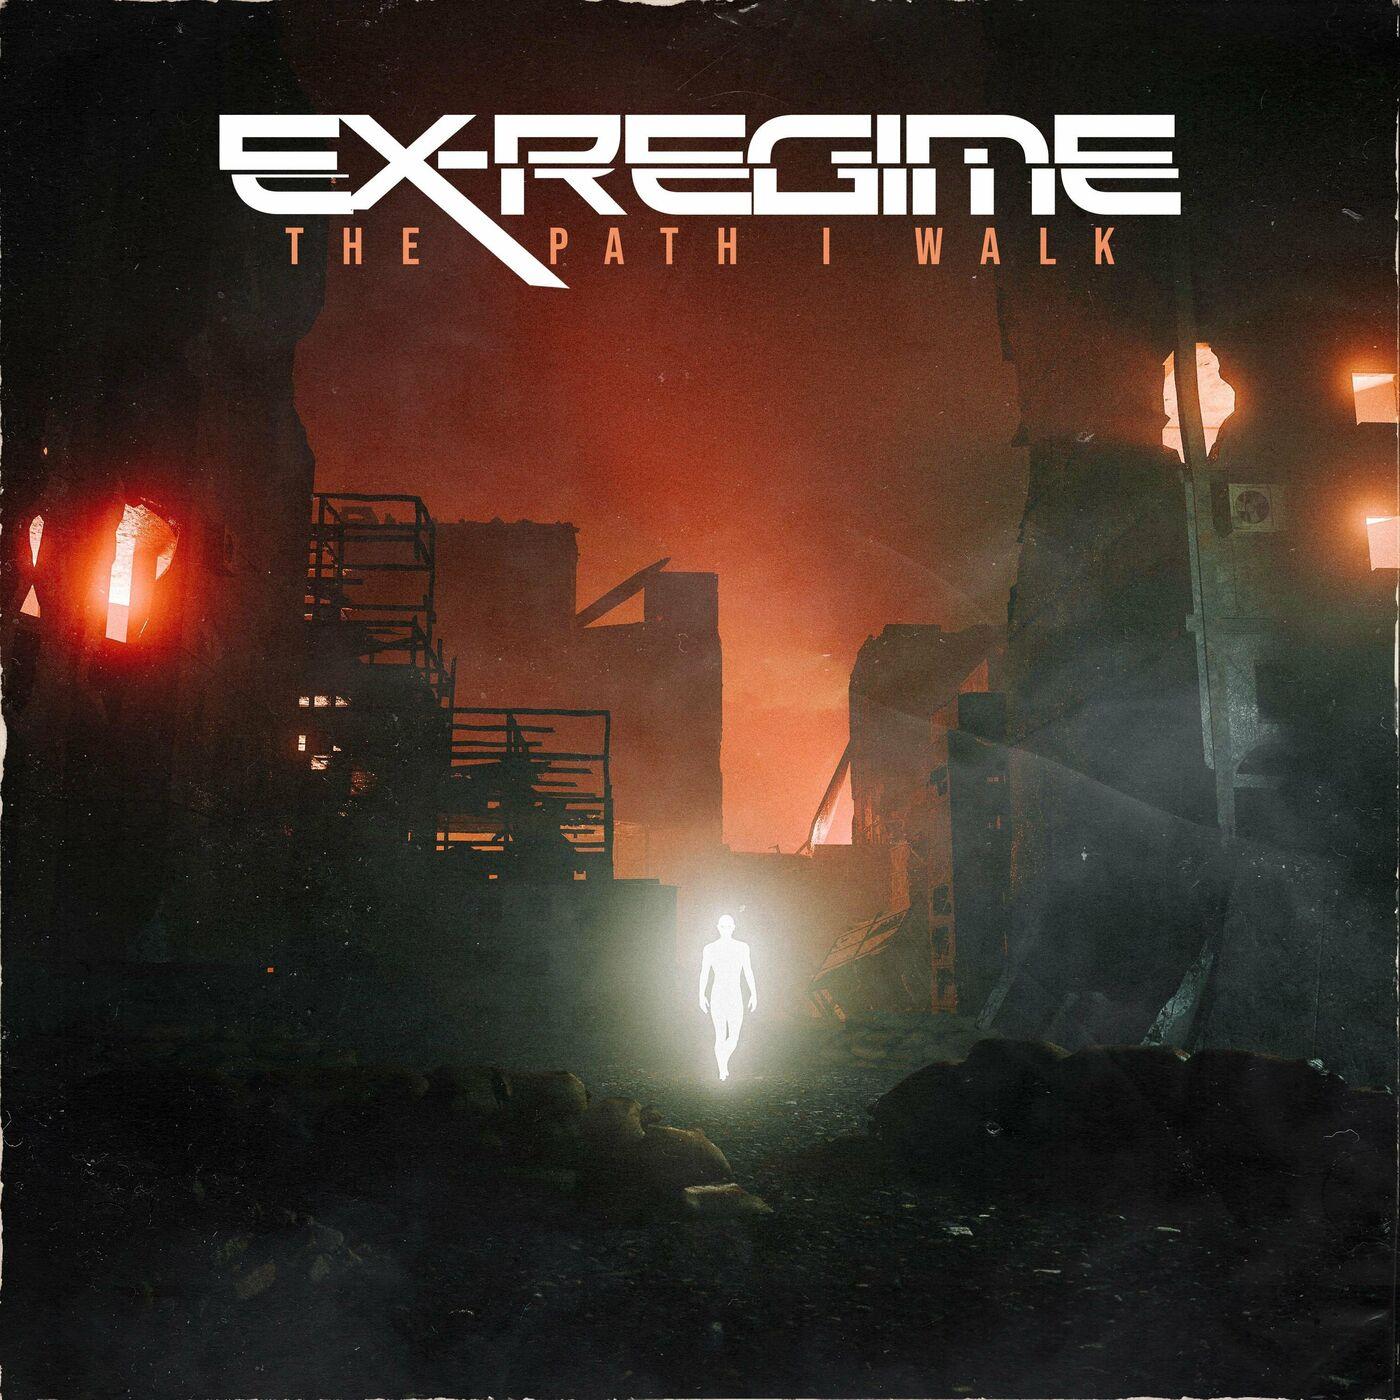 Ex-Regime - The Path I Walk [EP] (2020)